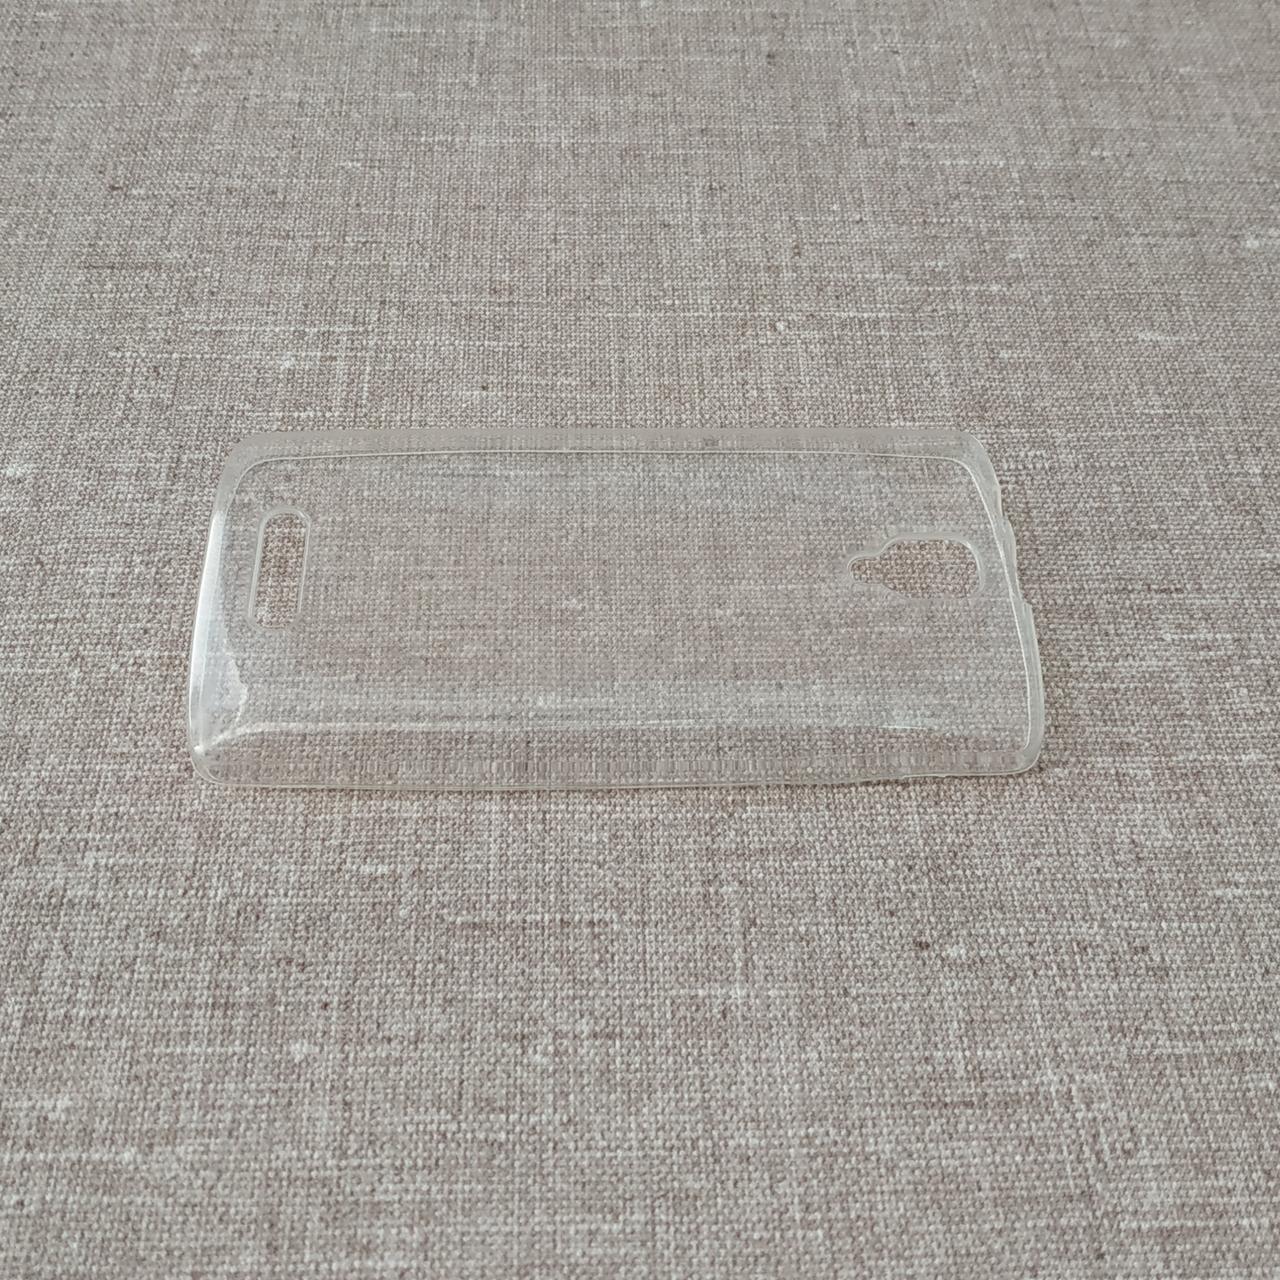 Чехлы для других смартфонов TPU Ultrathin 0.33mm Lenovo A1000 soft-clear Для телефона